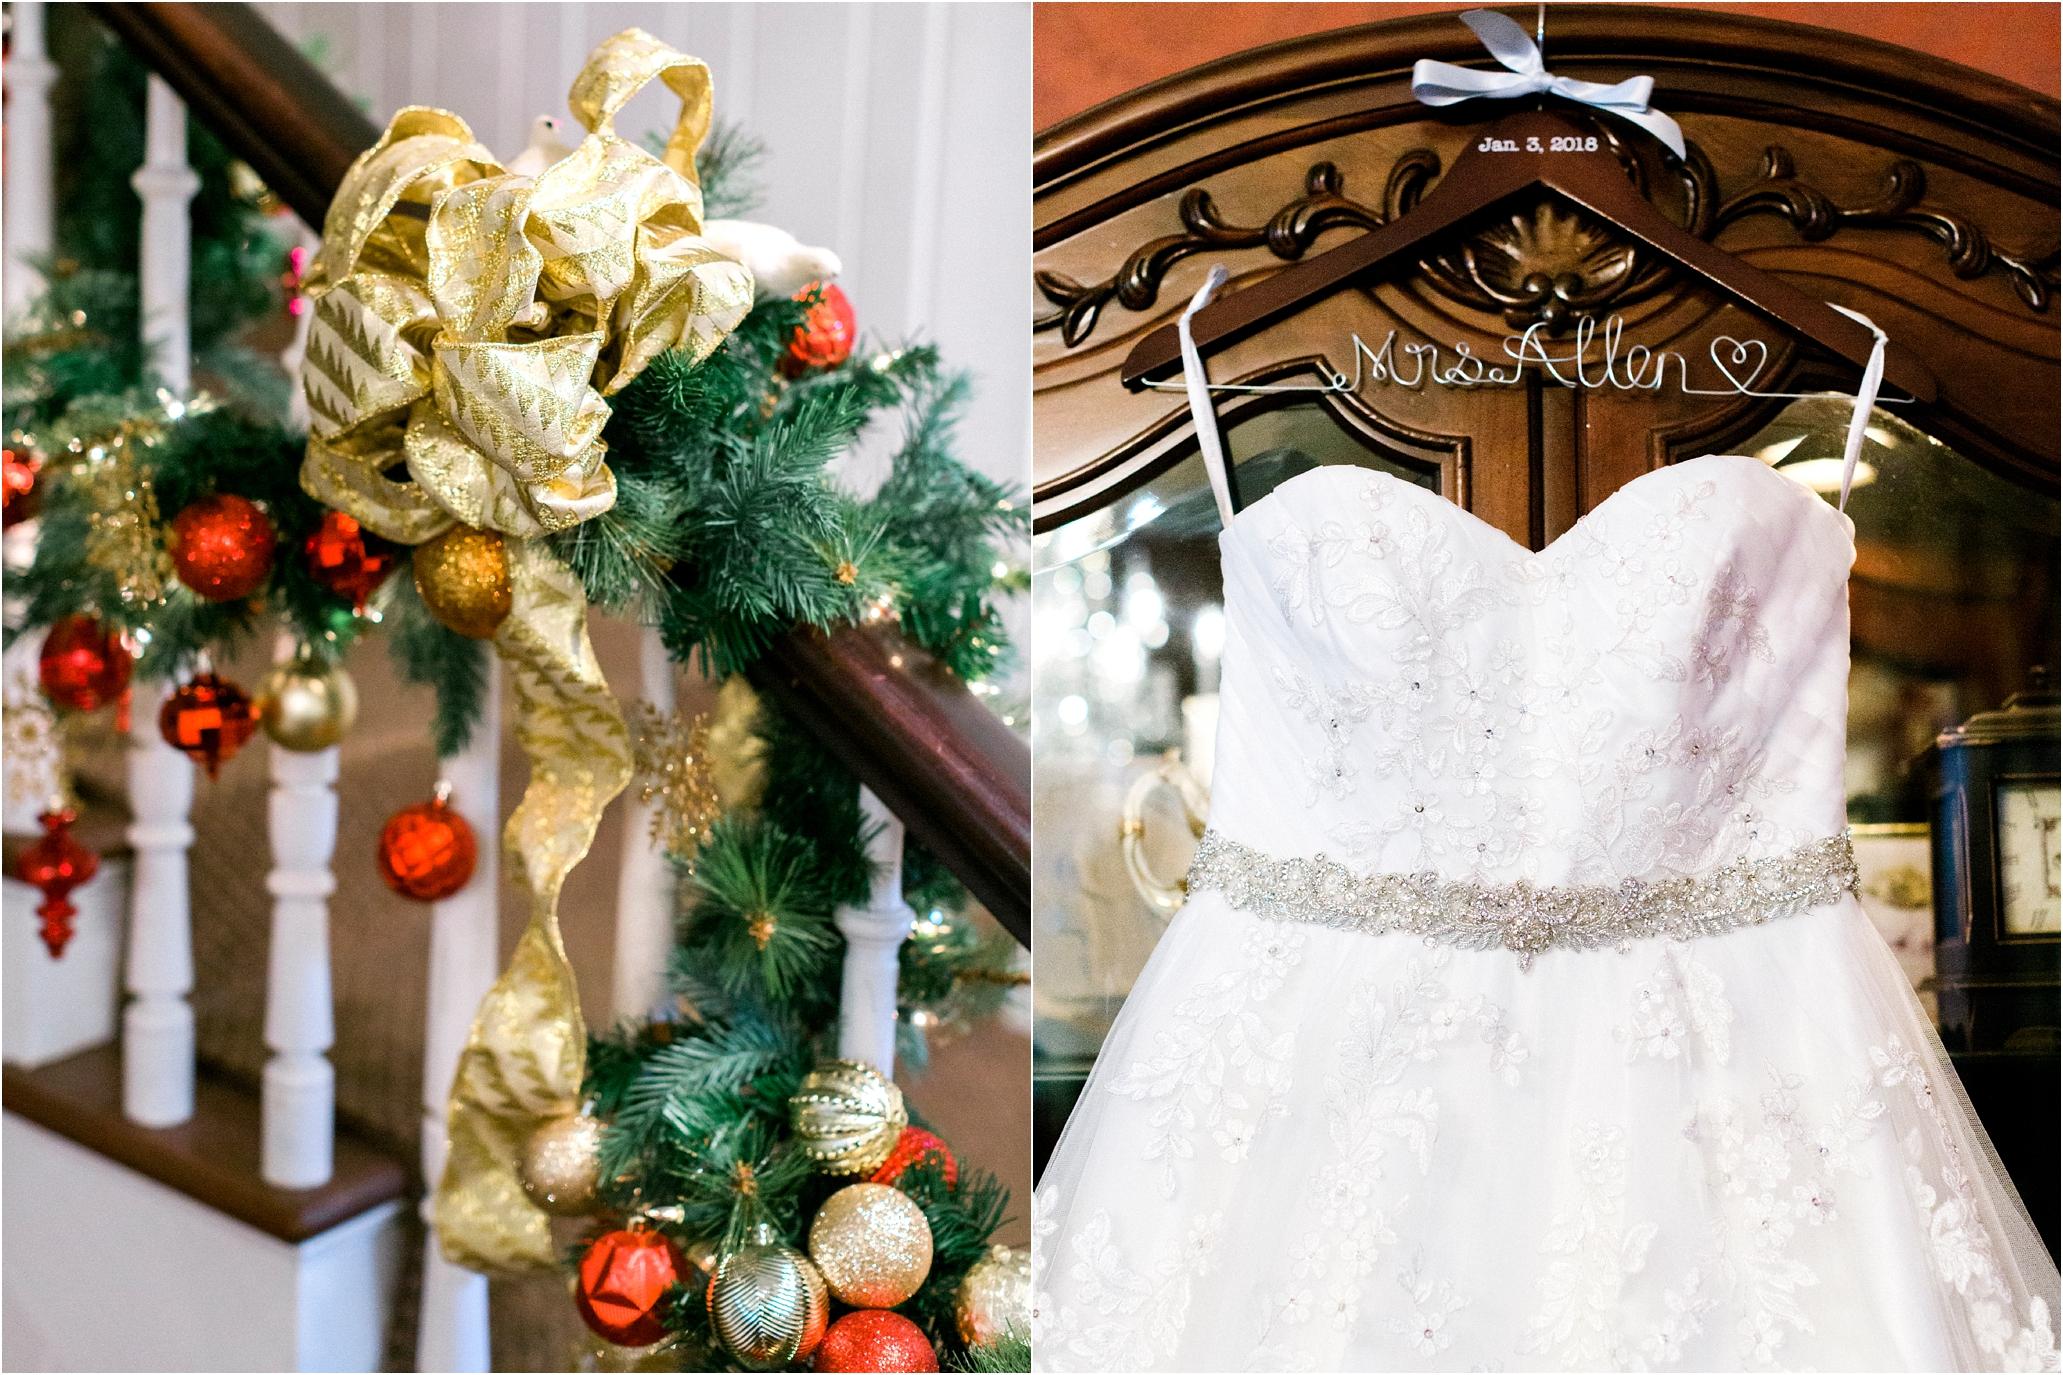 Lisa Silva Photography- Ponte Vedra Beach and Jacksonville, Florida Fine Art Film Wedding Photography- Wedding at The White Room Villa Blanca in St. Augustine, Florida_0006.jpg